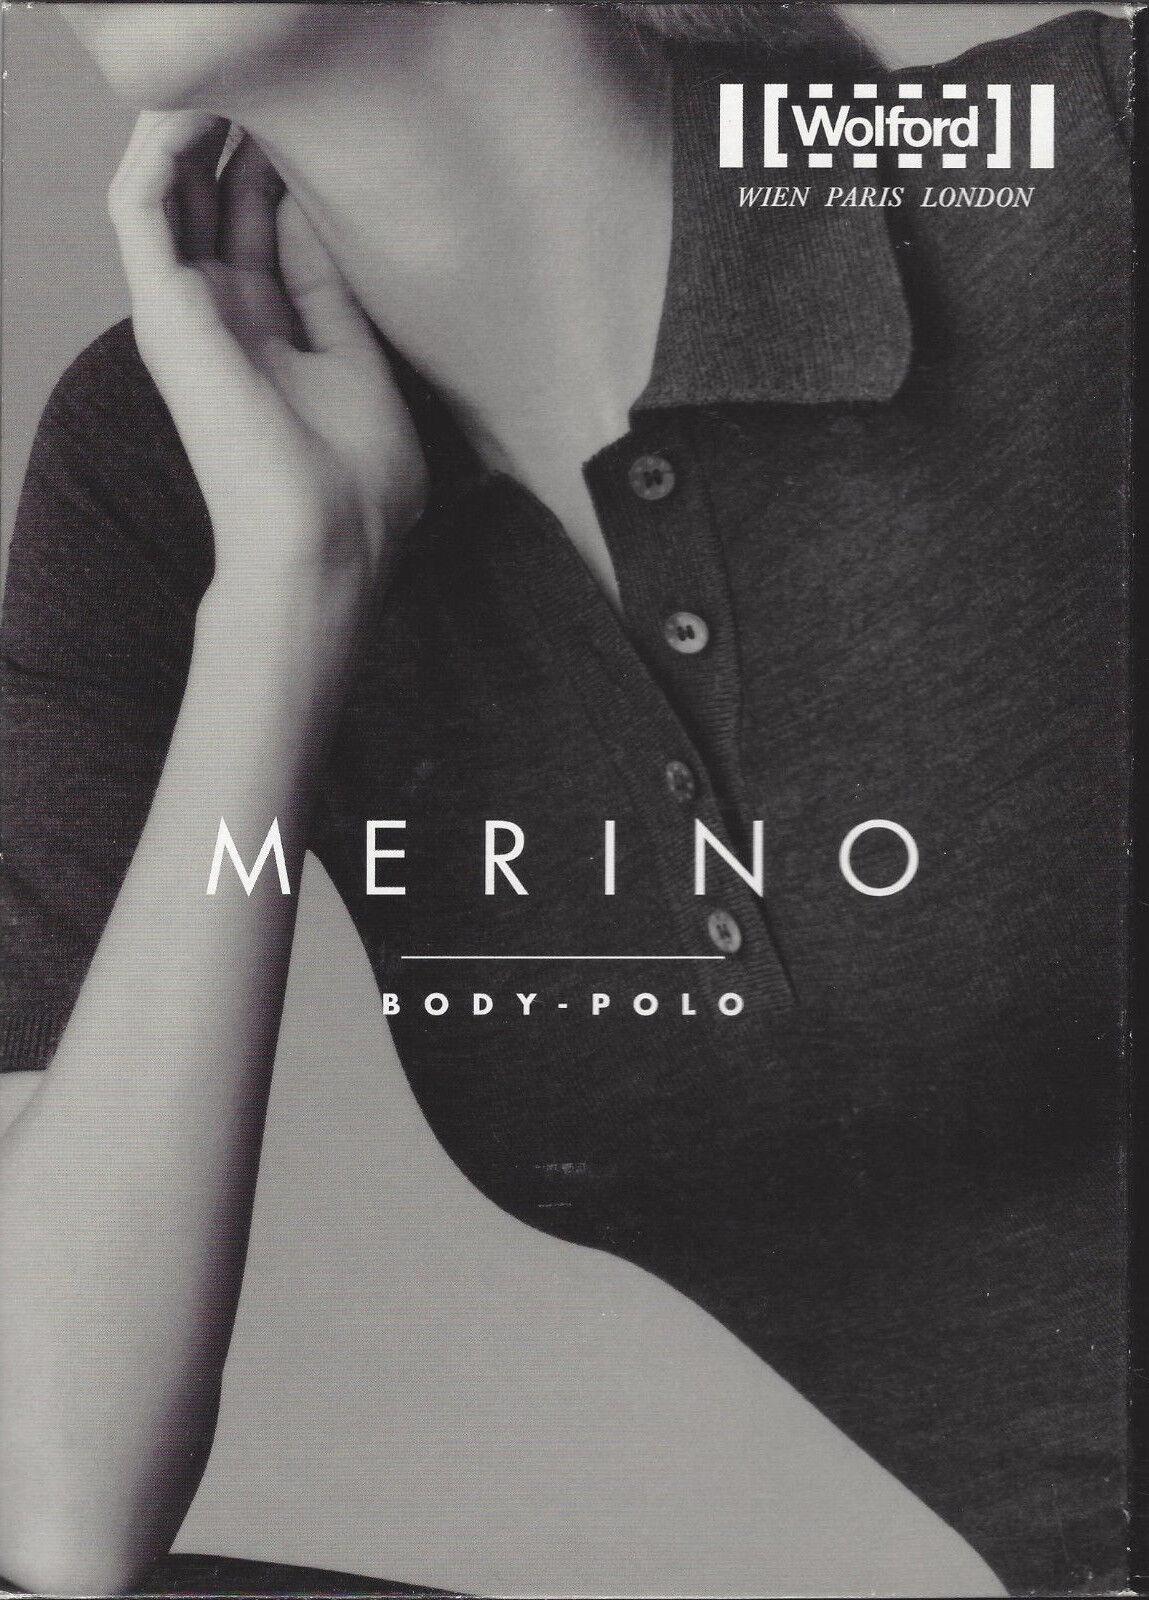 RARITÄT  •  Wolford Merino Body Polo • XS • grey  ... Rundum nahtloser Bodysuit